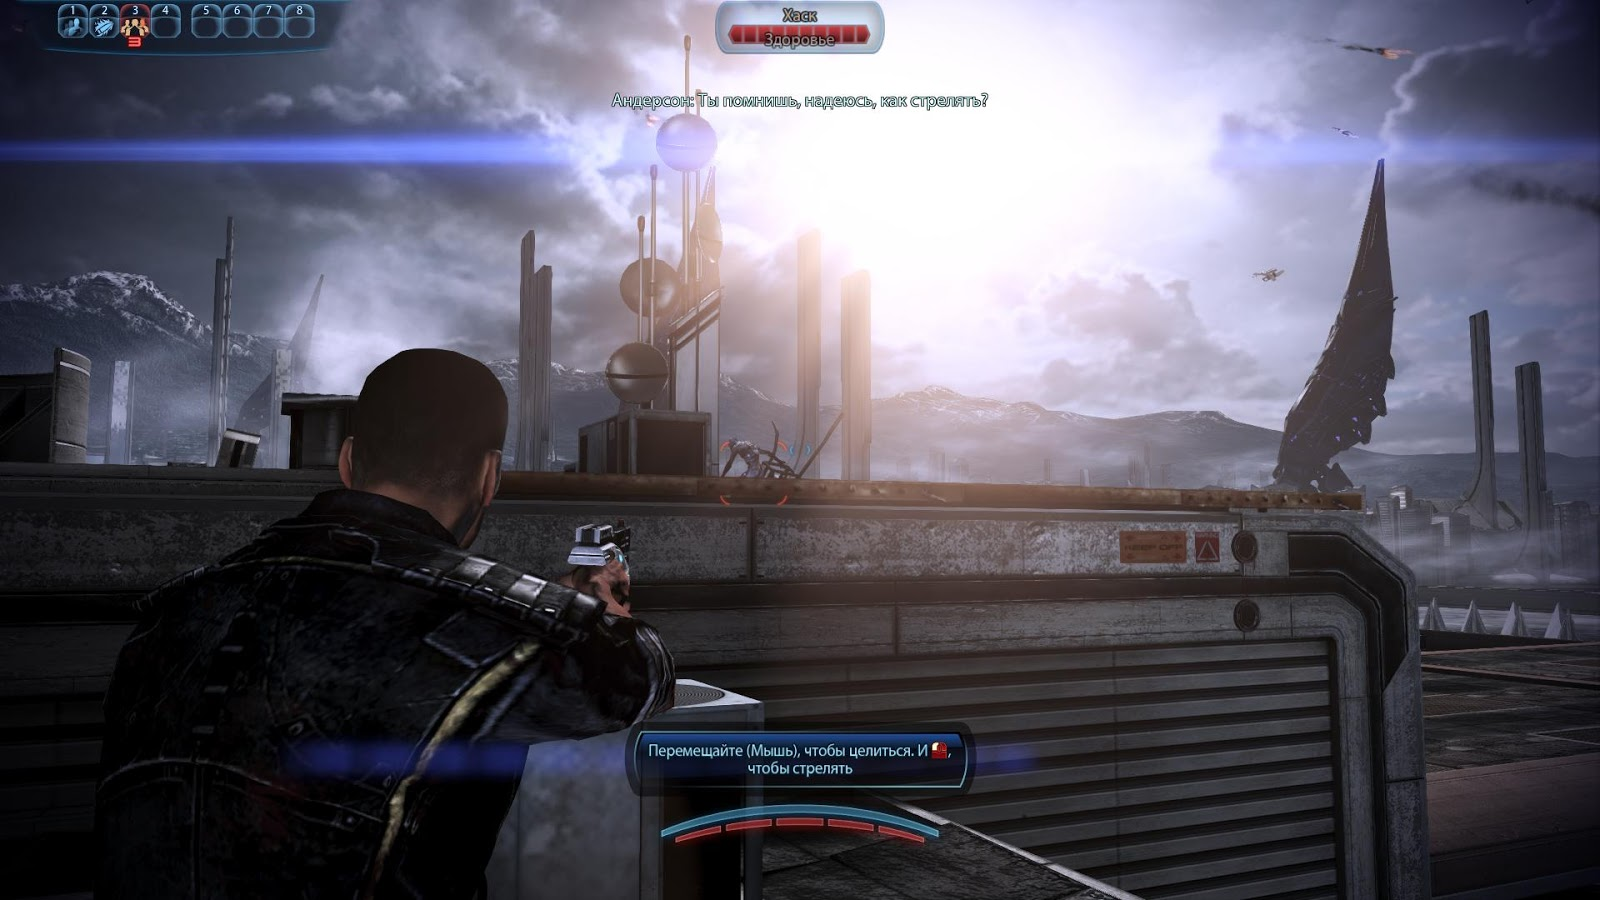 56c2fe5de2c3dd8dce66d6eb6b16a898 02a04b6cf7420f85cd91e61399f81456 - Mass Effect 3: Digital Deluxe Edition [v. 1.5 + 14 DLC]